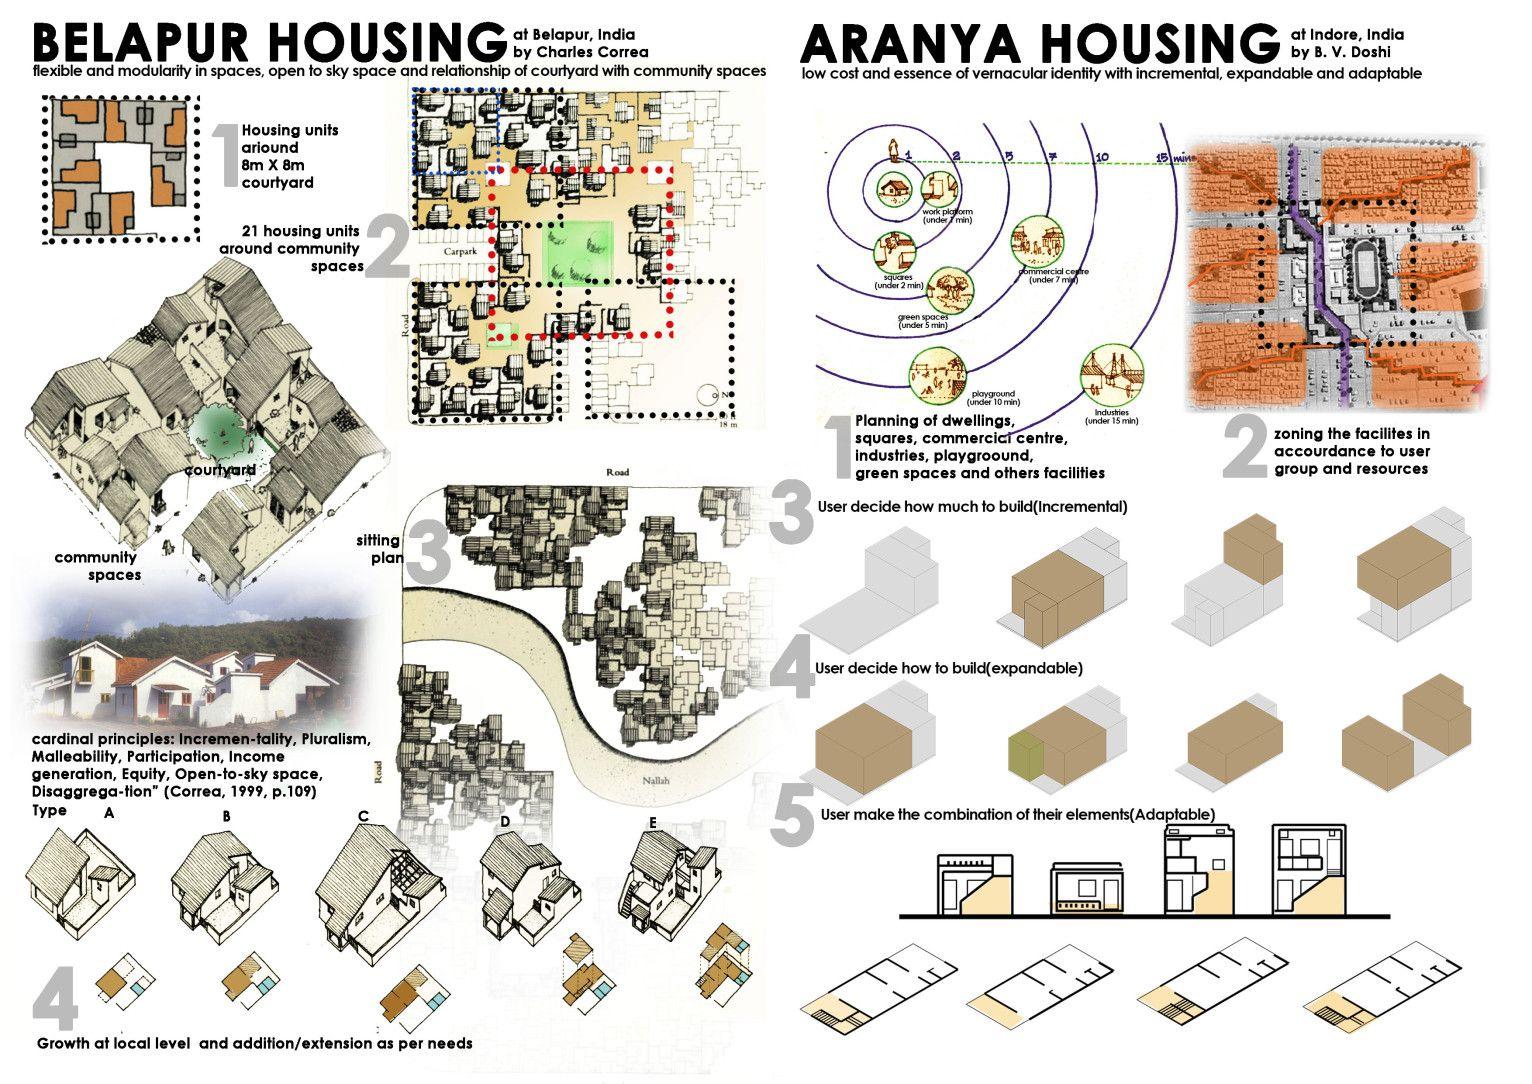 Belapur Housing And Aranya Housing How To Plan Aranya Community Space